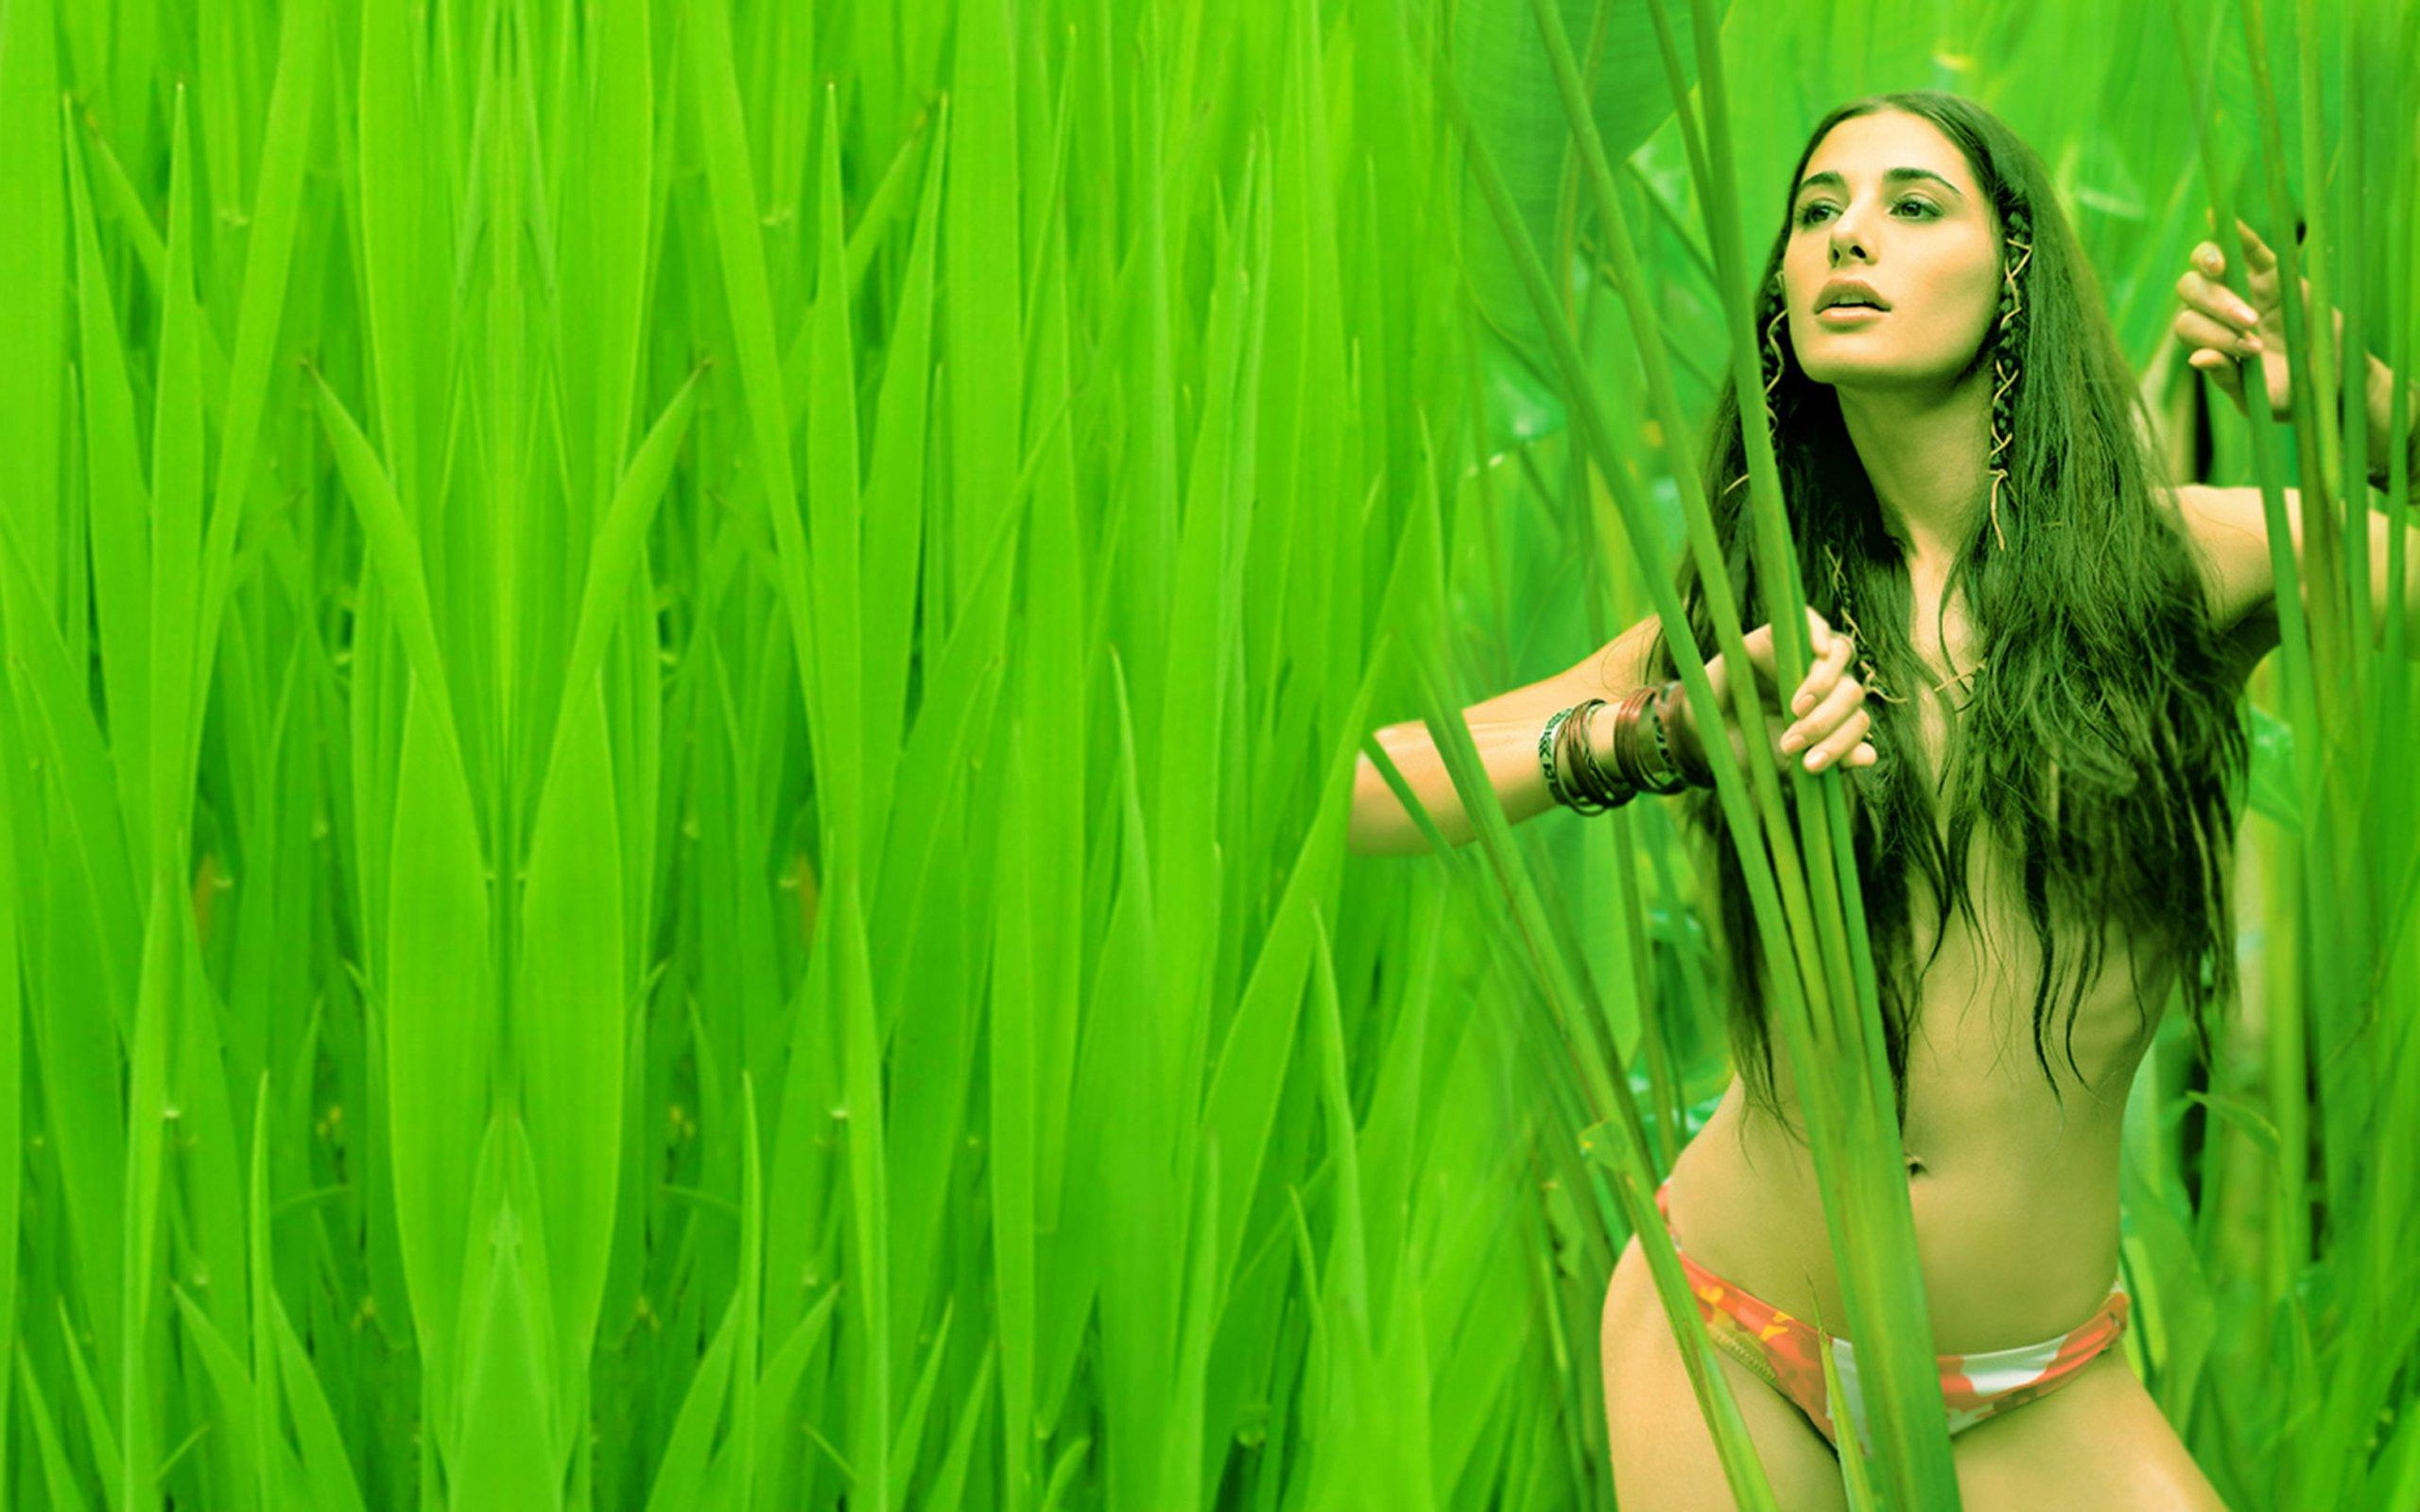 nargis fakhri actress bollywood model babe sexy bikini